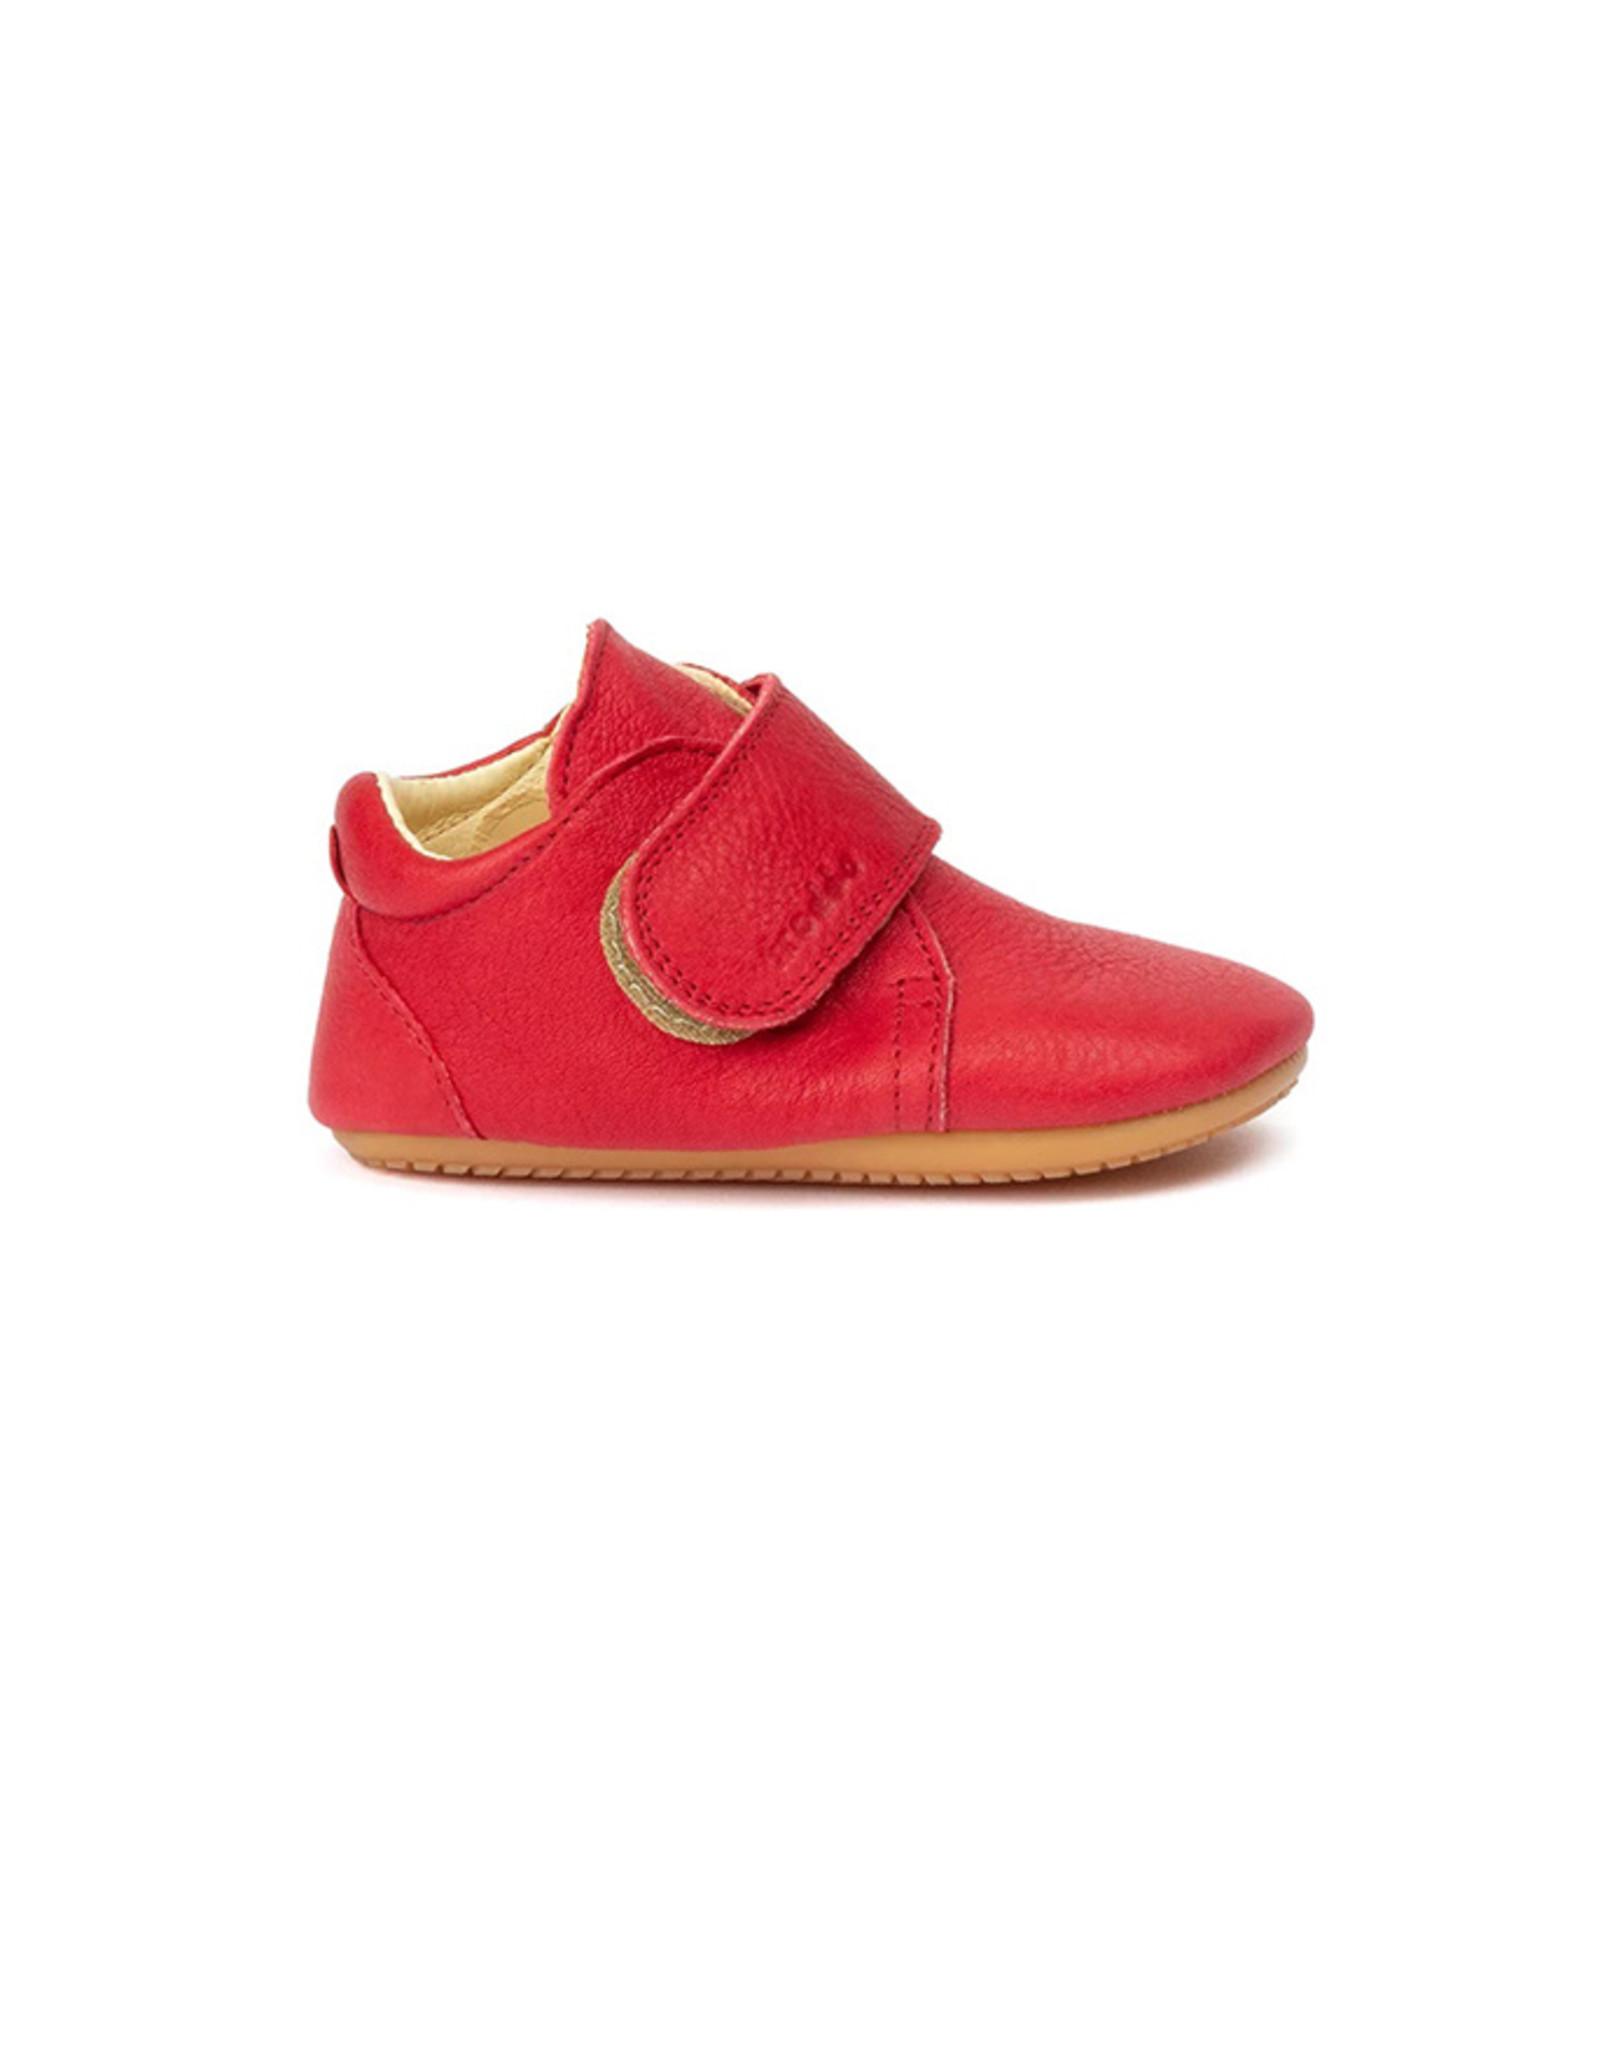 Prewalker Shoes Red